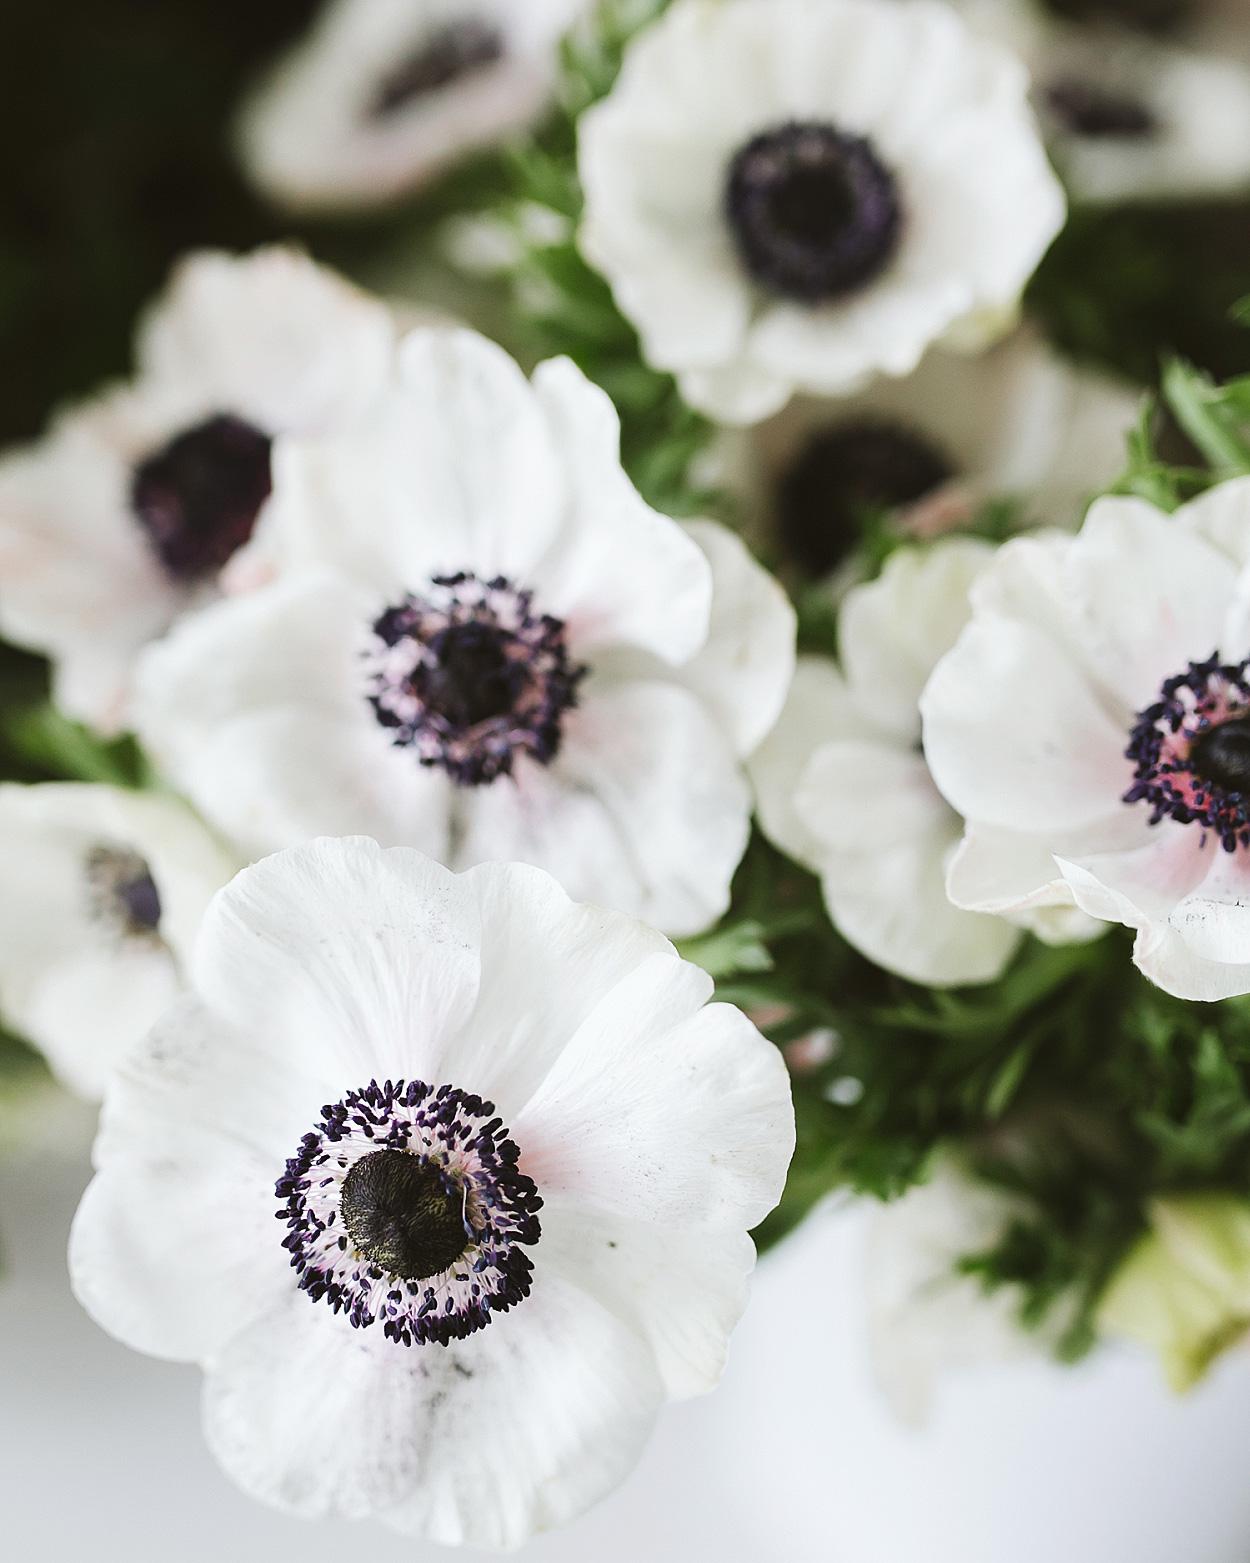 romantic-wedding-flowers-panda-anemone-0516.jpg